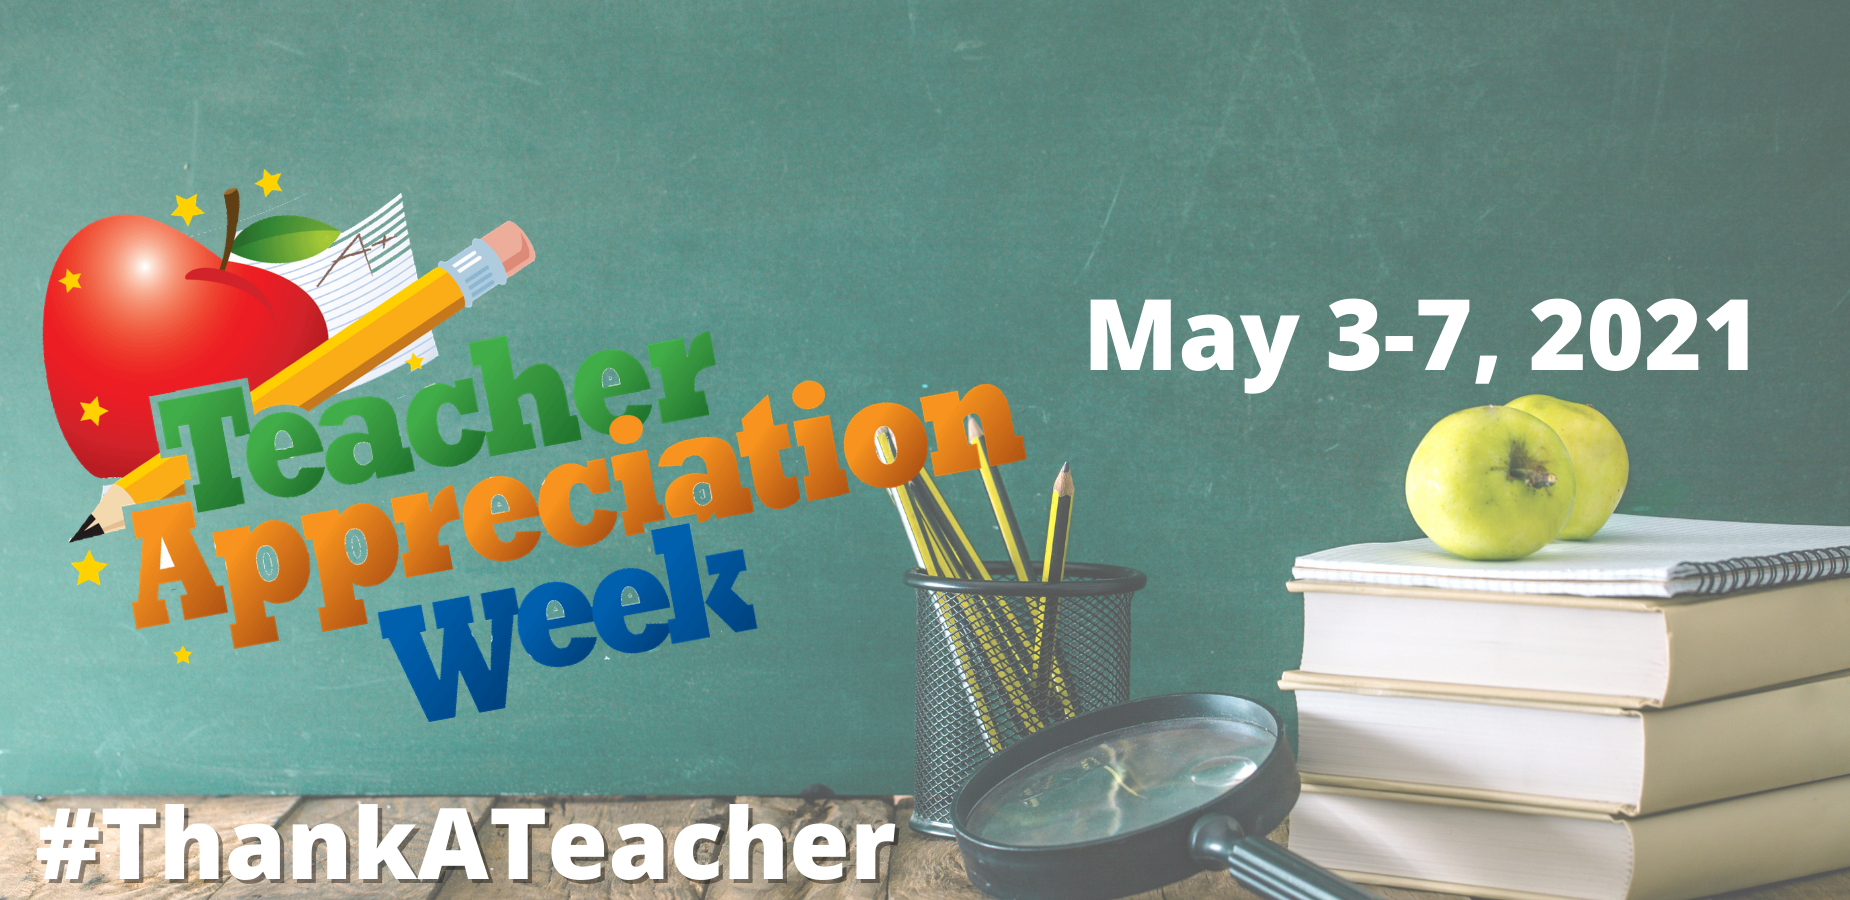 Teacher Appreciation Week, May 3-7, 2021